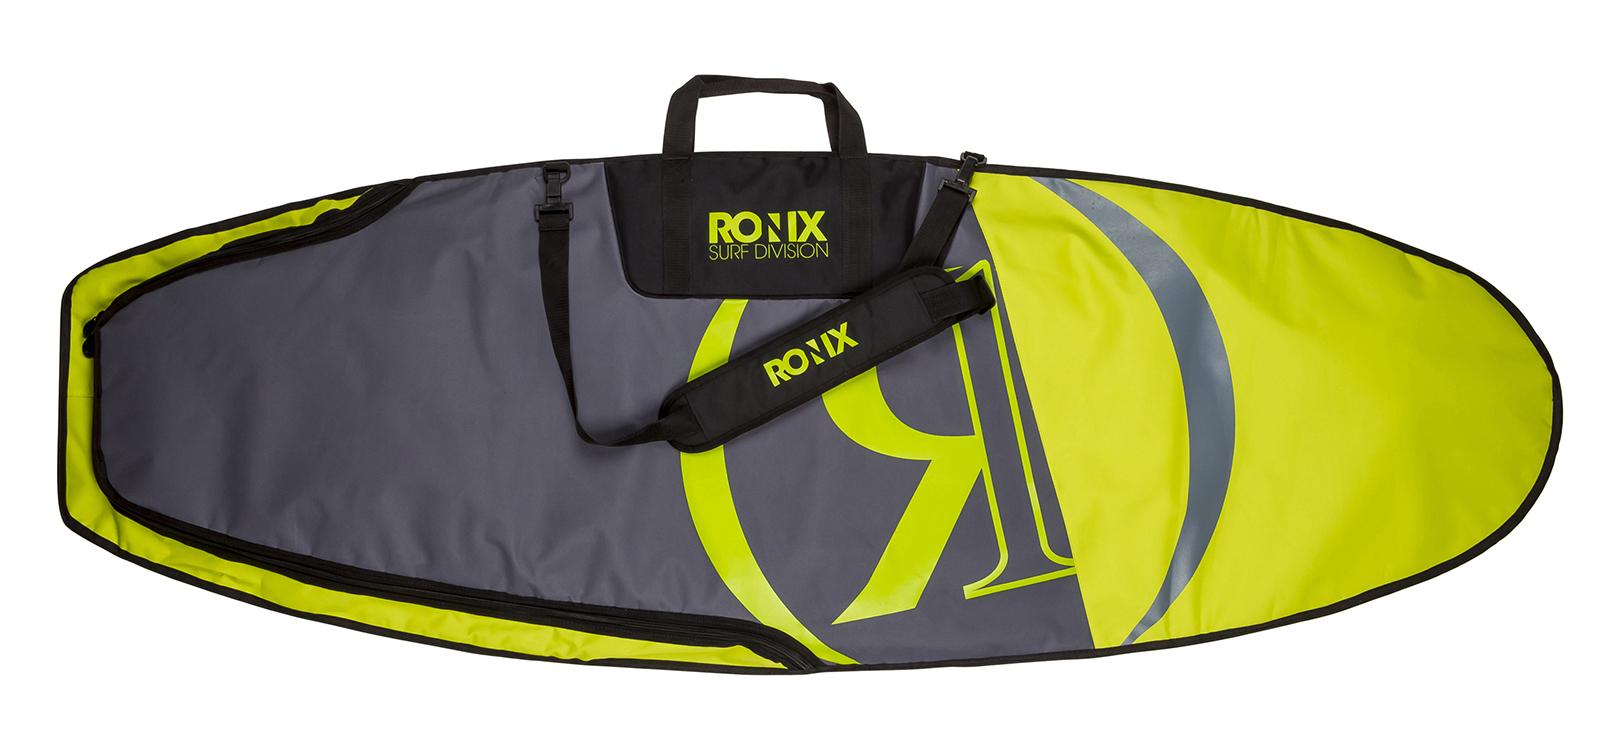 DEMPSEY 5'1''-6'2'' SURF BAG RONIX 2017